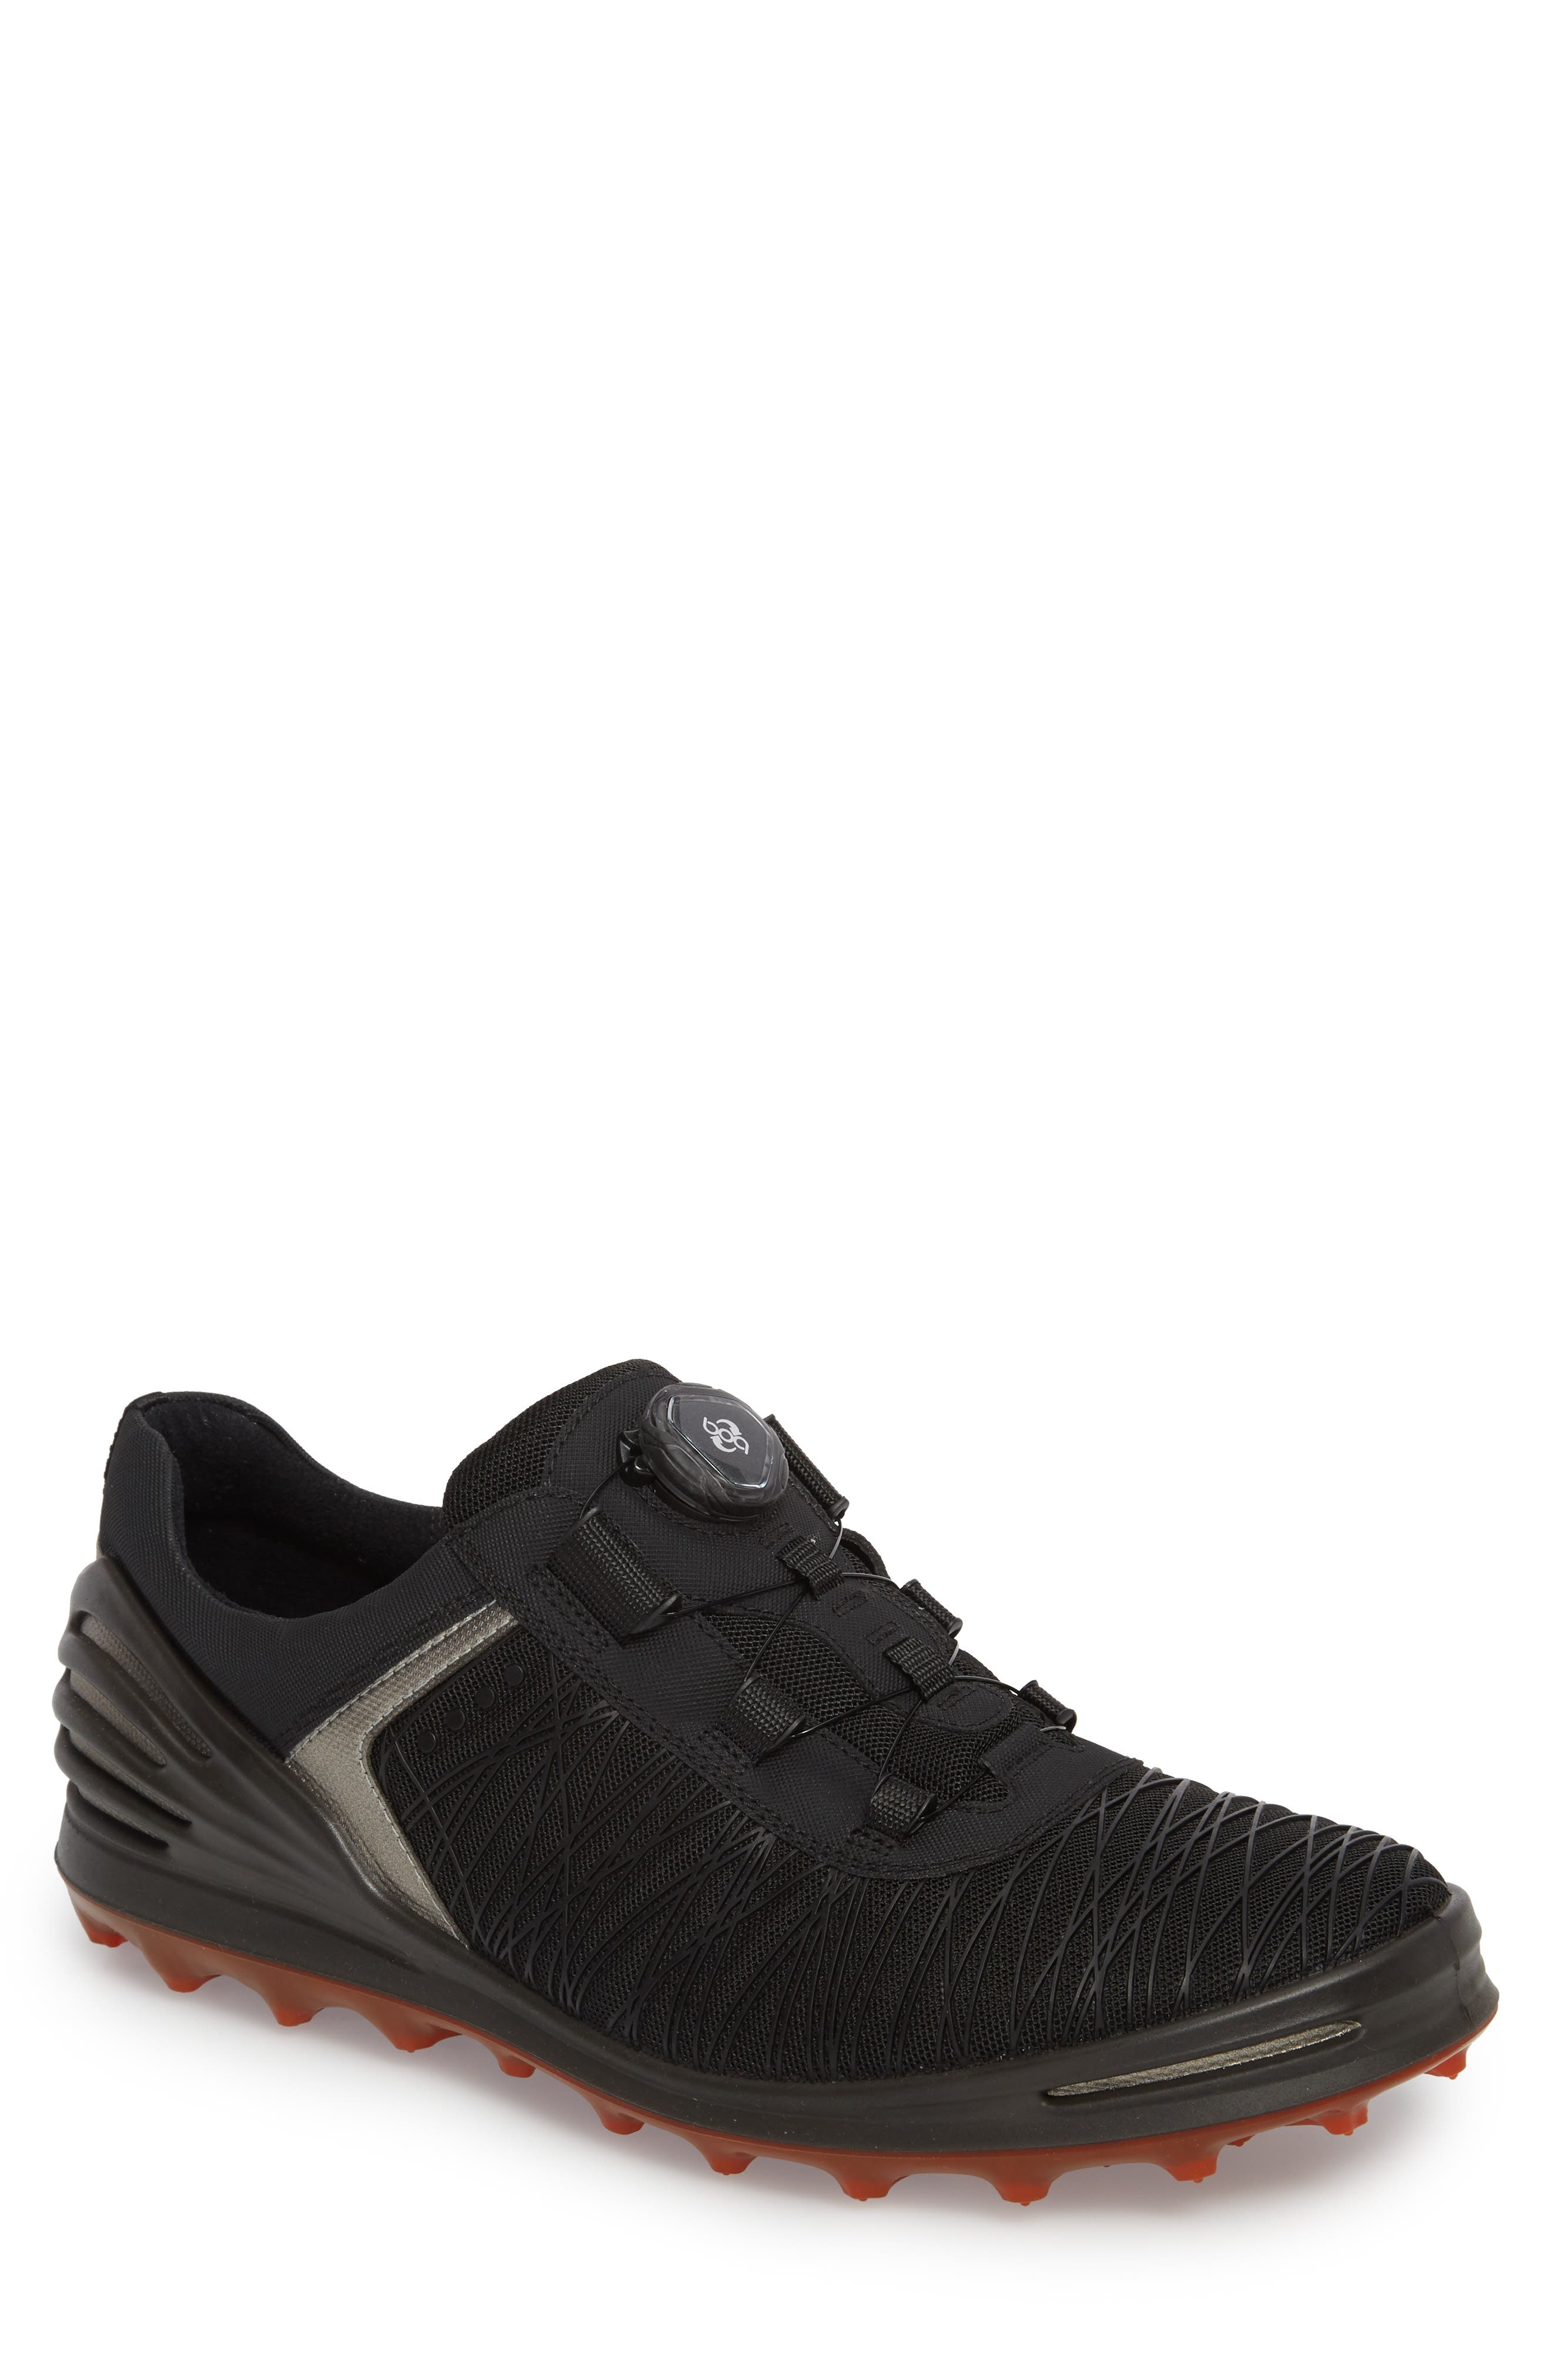 Alternate Image 1 Selected - ECCO Cage Pro BOA Golf Shoe (Men)